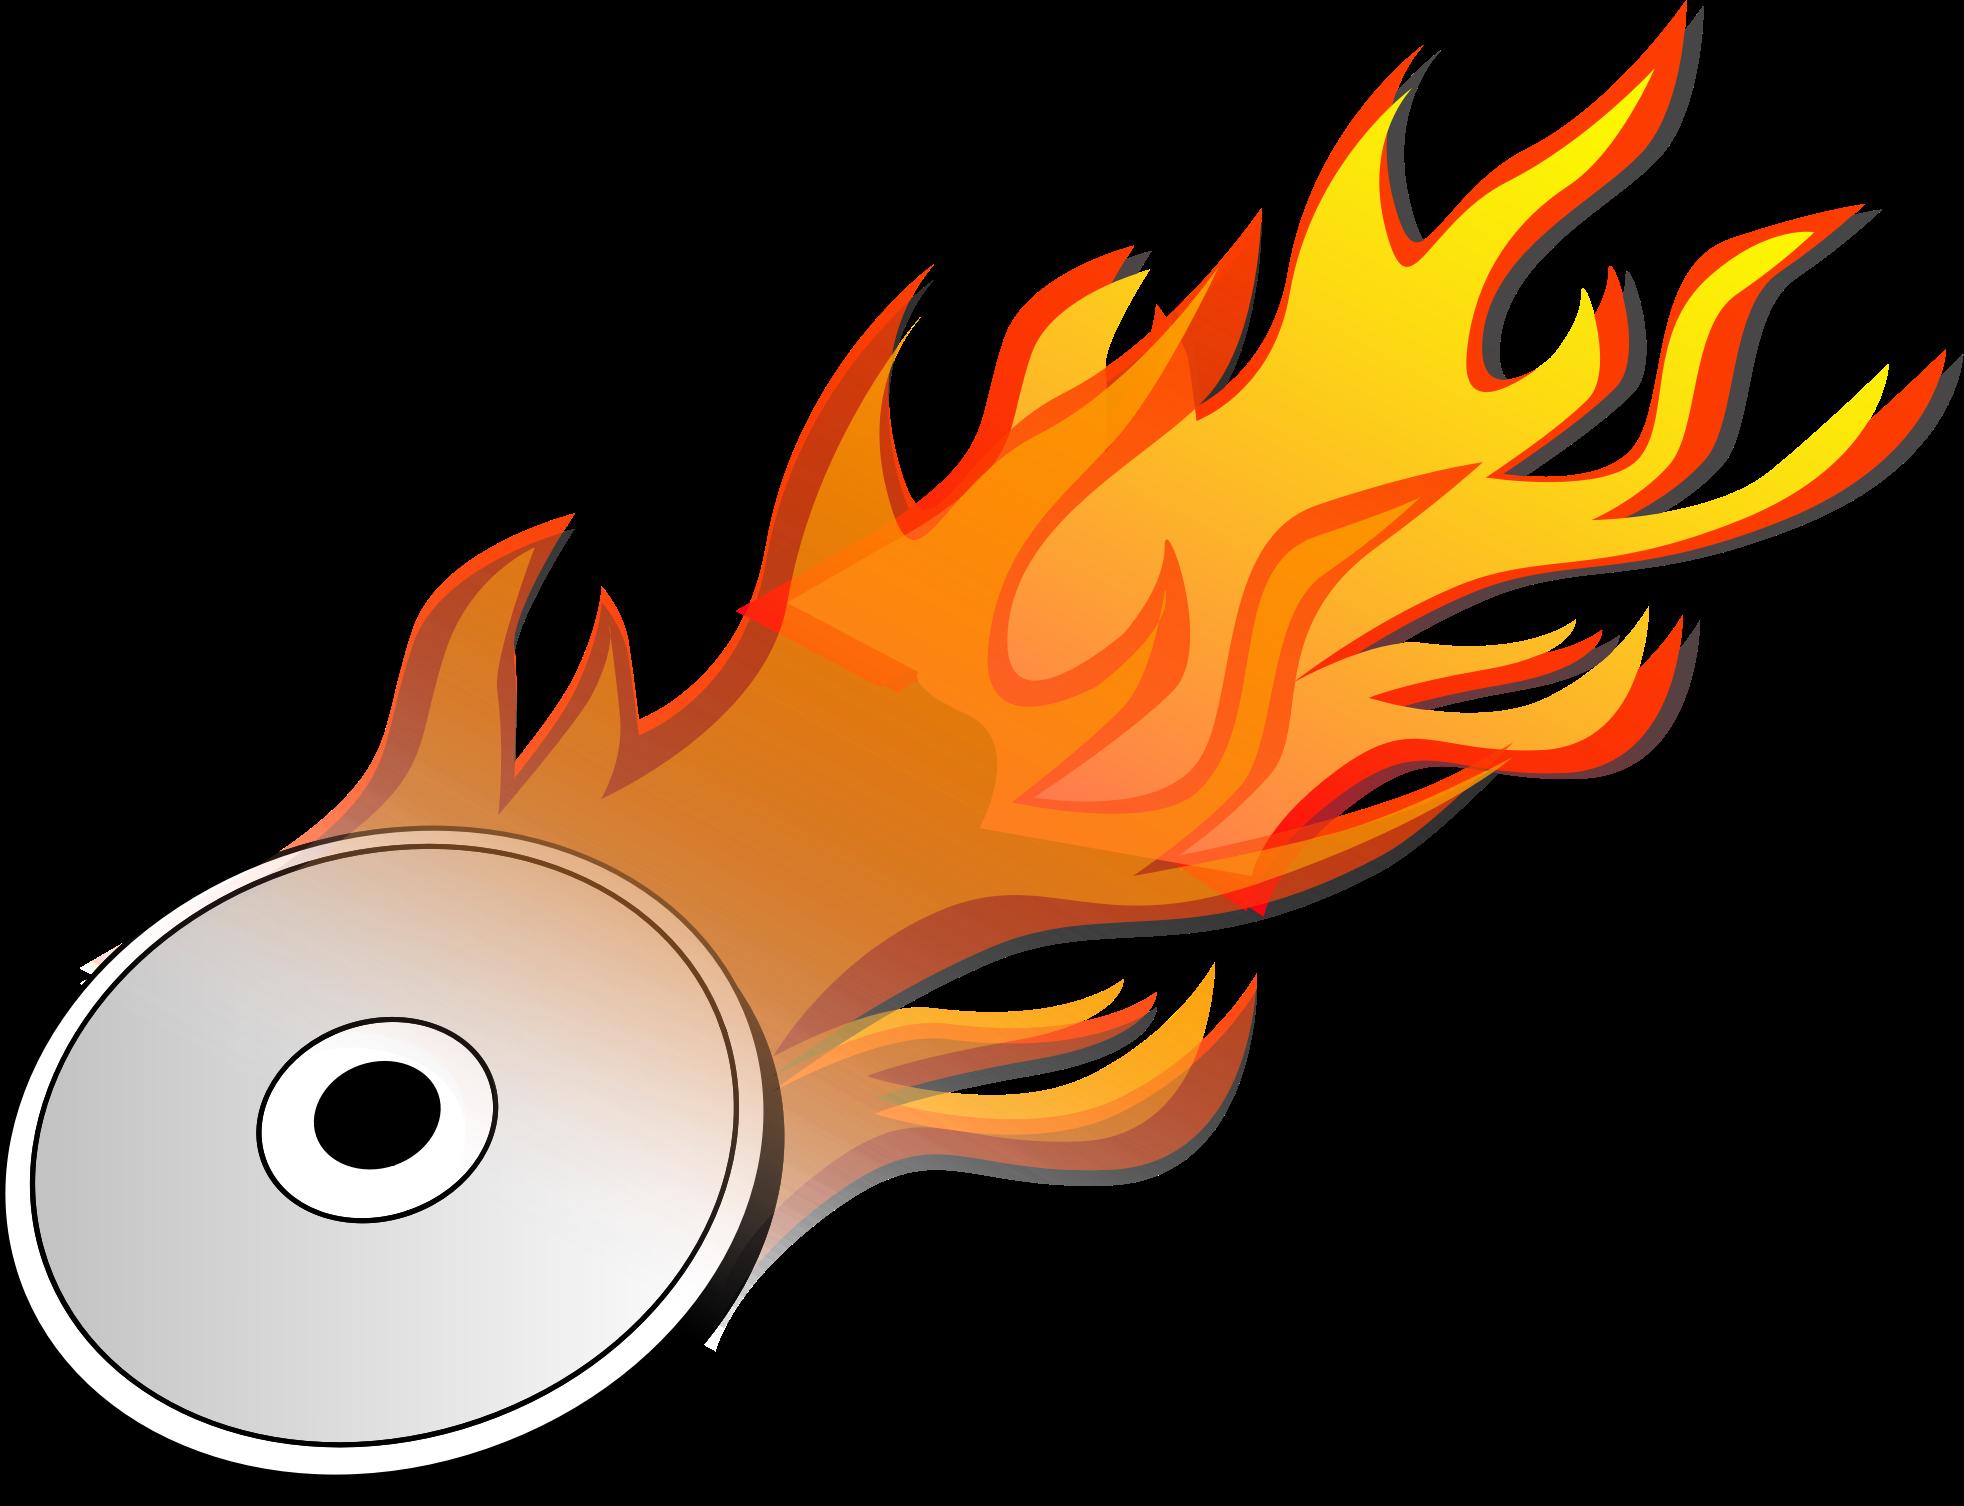 Flames heat